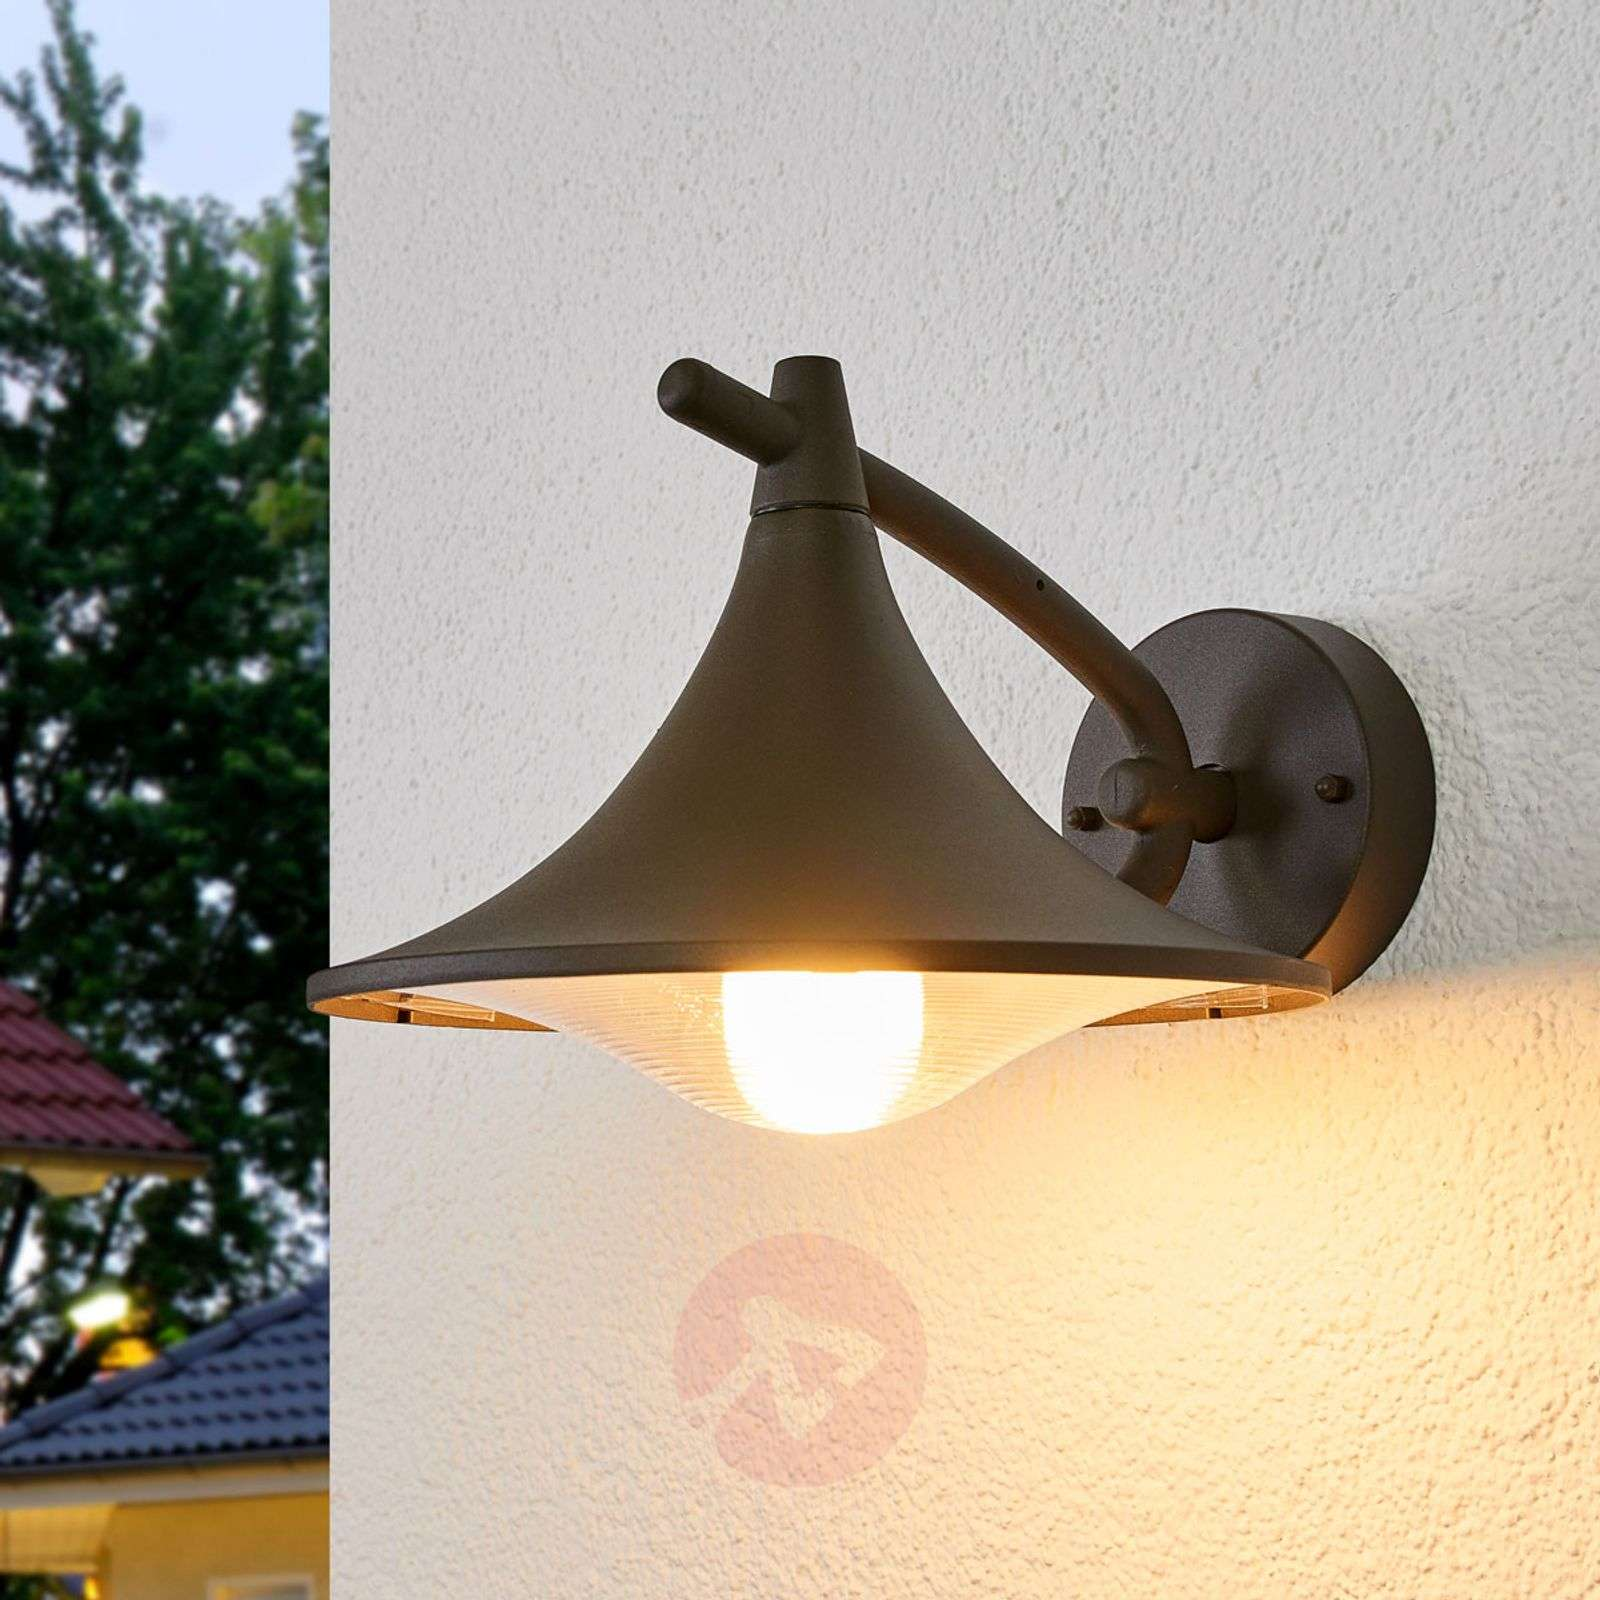 Anthracite-coloured Cedar outdoor wall light-7531783-01